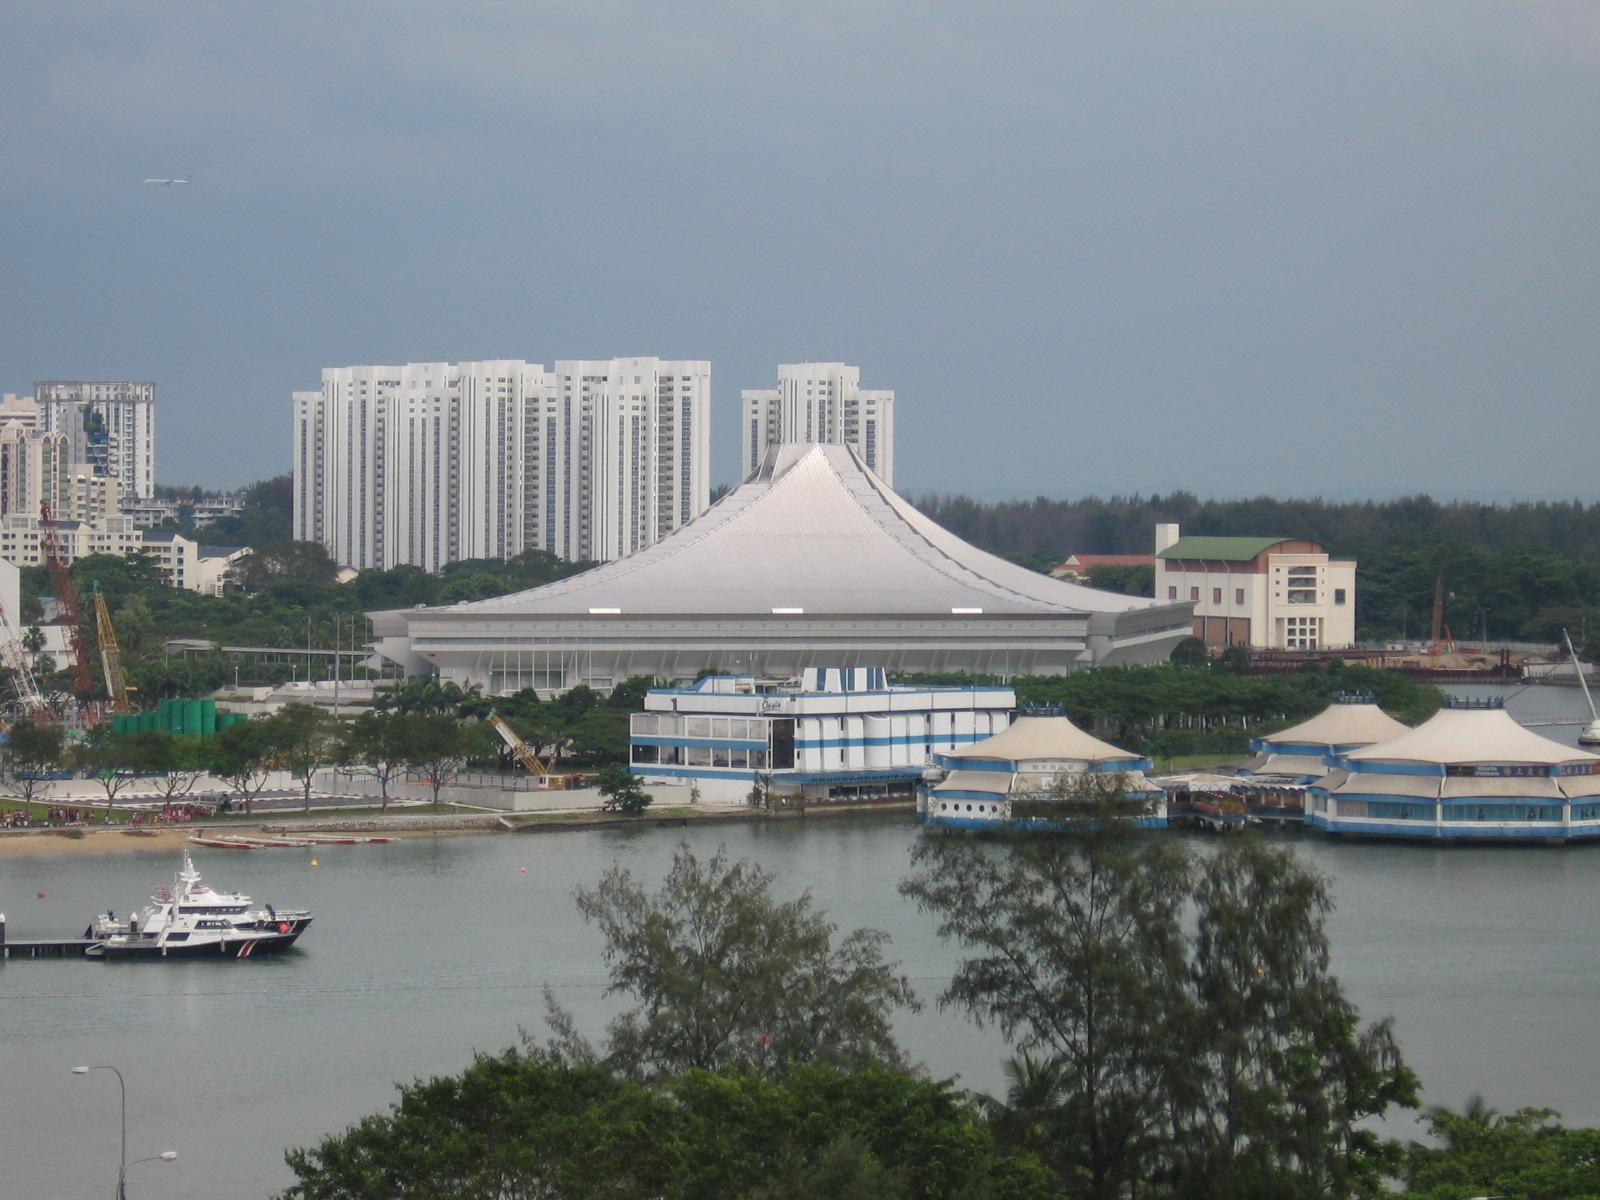 JW Marriott Hotel Singapore South Beach - Hotels & Resorts